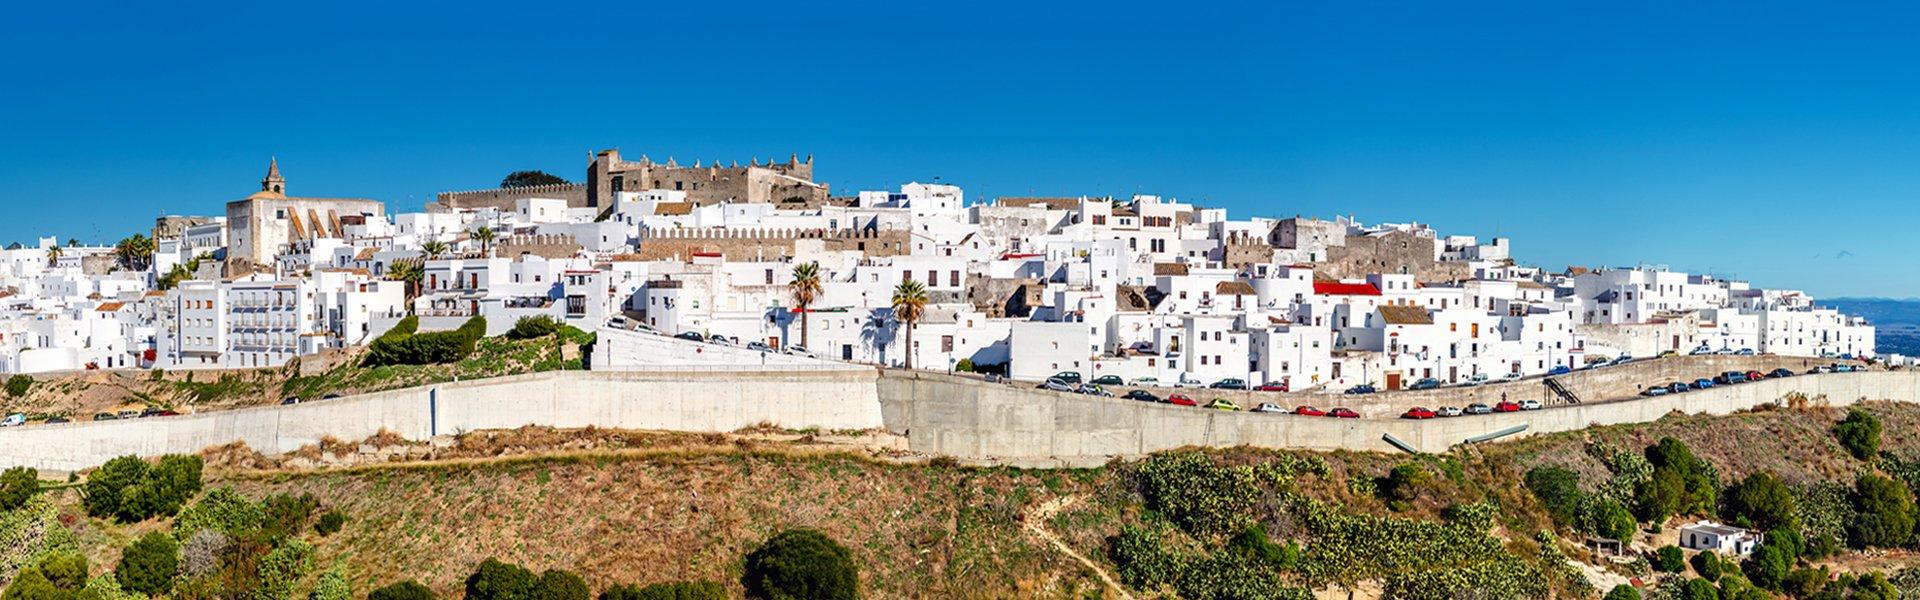 Andalusië Costa de la Luz, Spanje